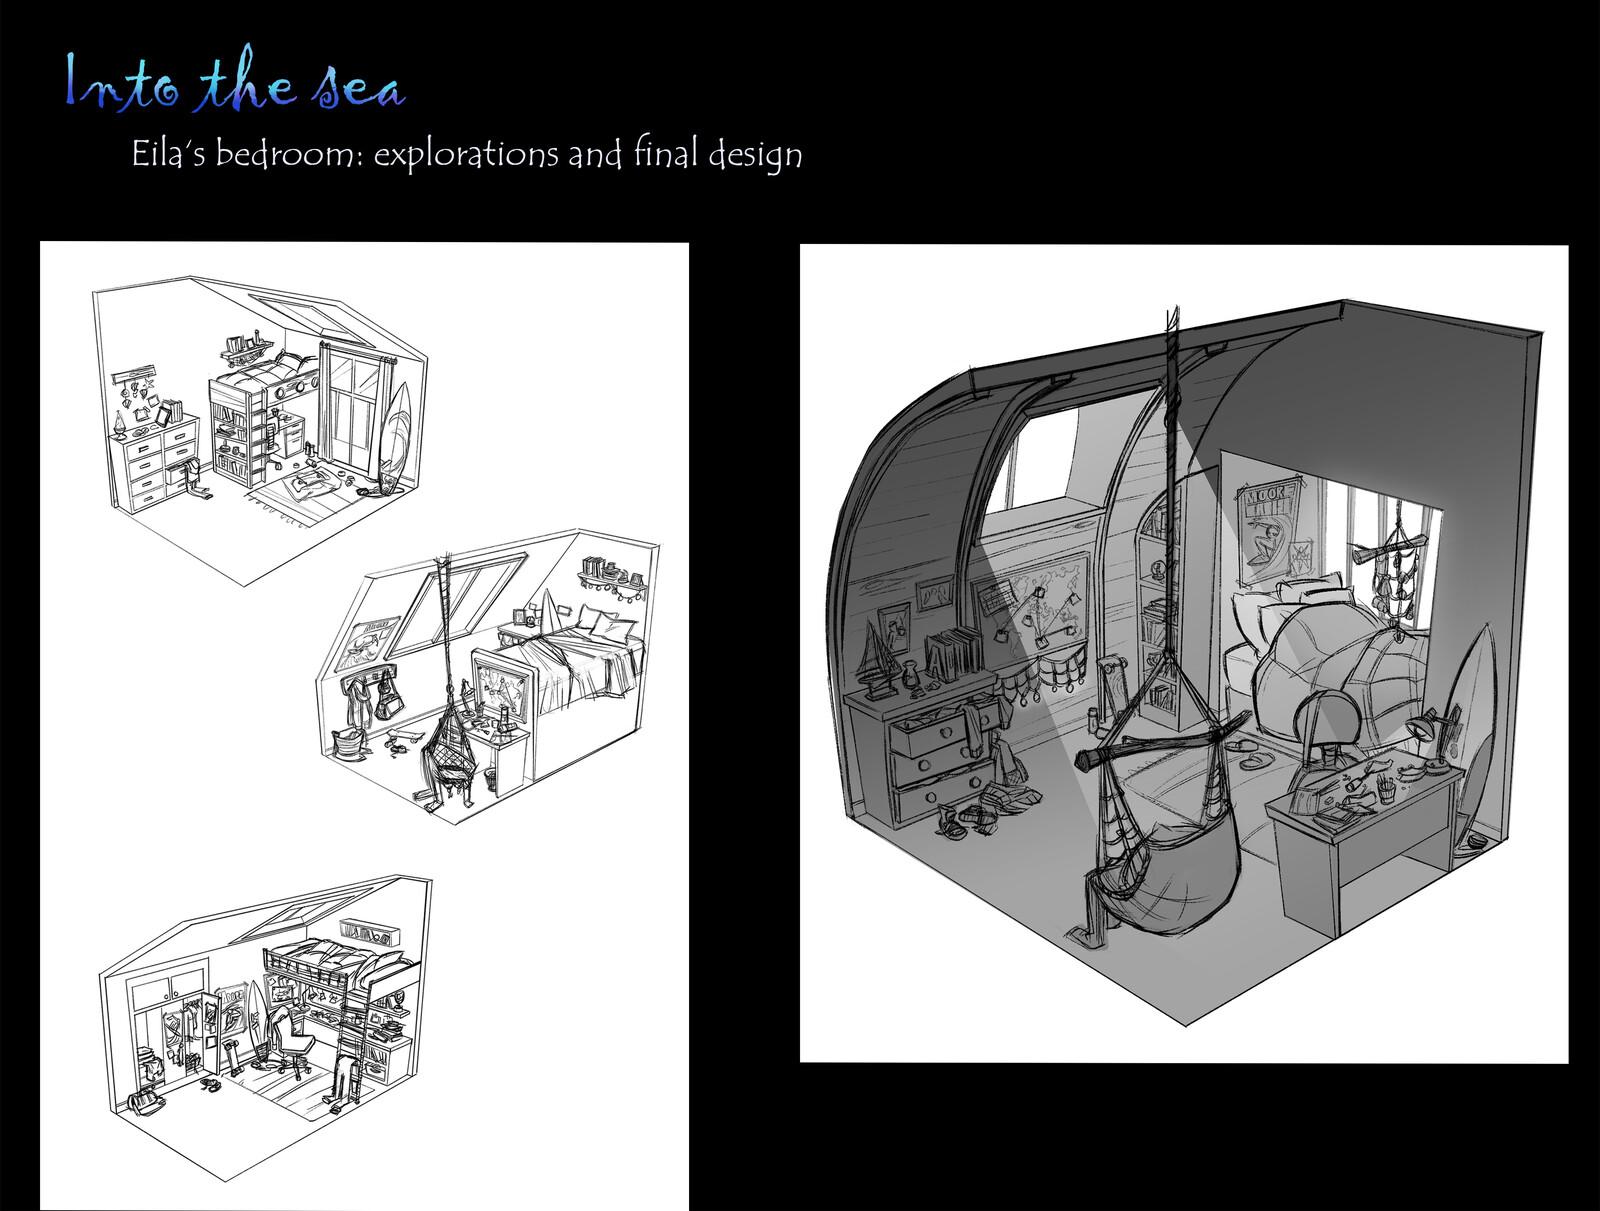 Set design: sketches